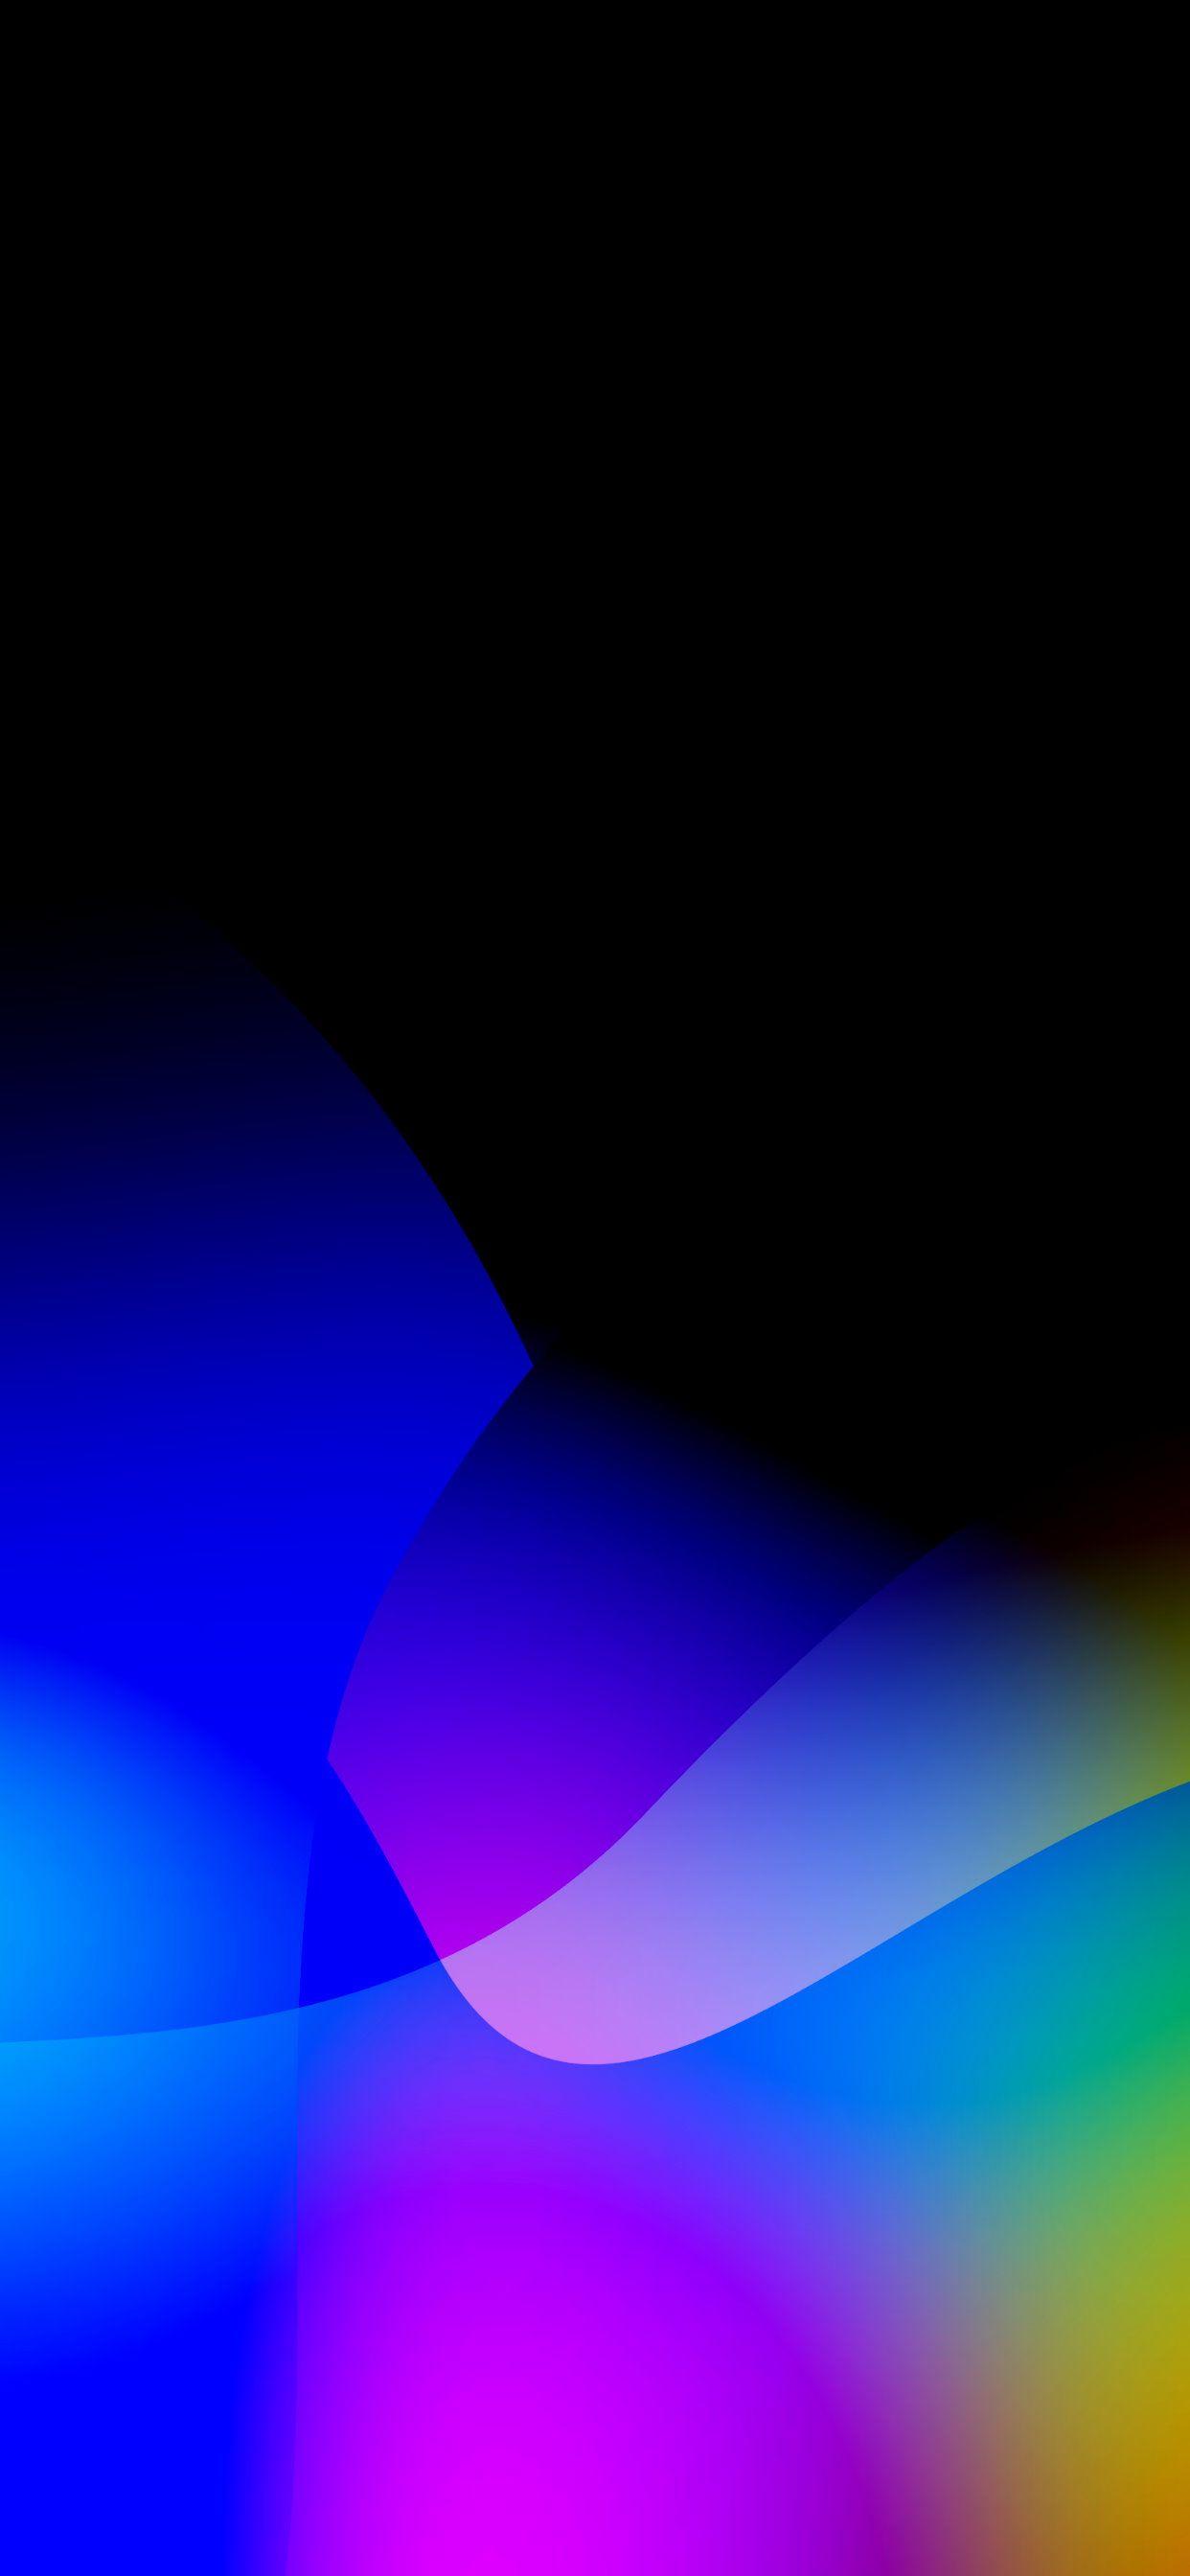 Wallpapers Apple Iphone Xs Max Fond D Ecran Telephone Fond D Ecran Abstrait Fond D Ecran Bleu Iphone